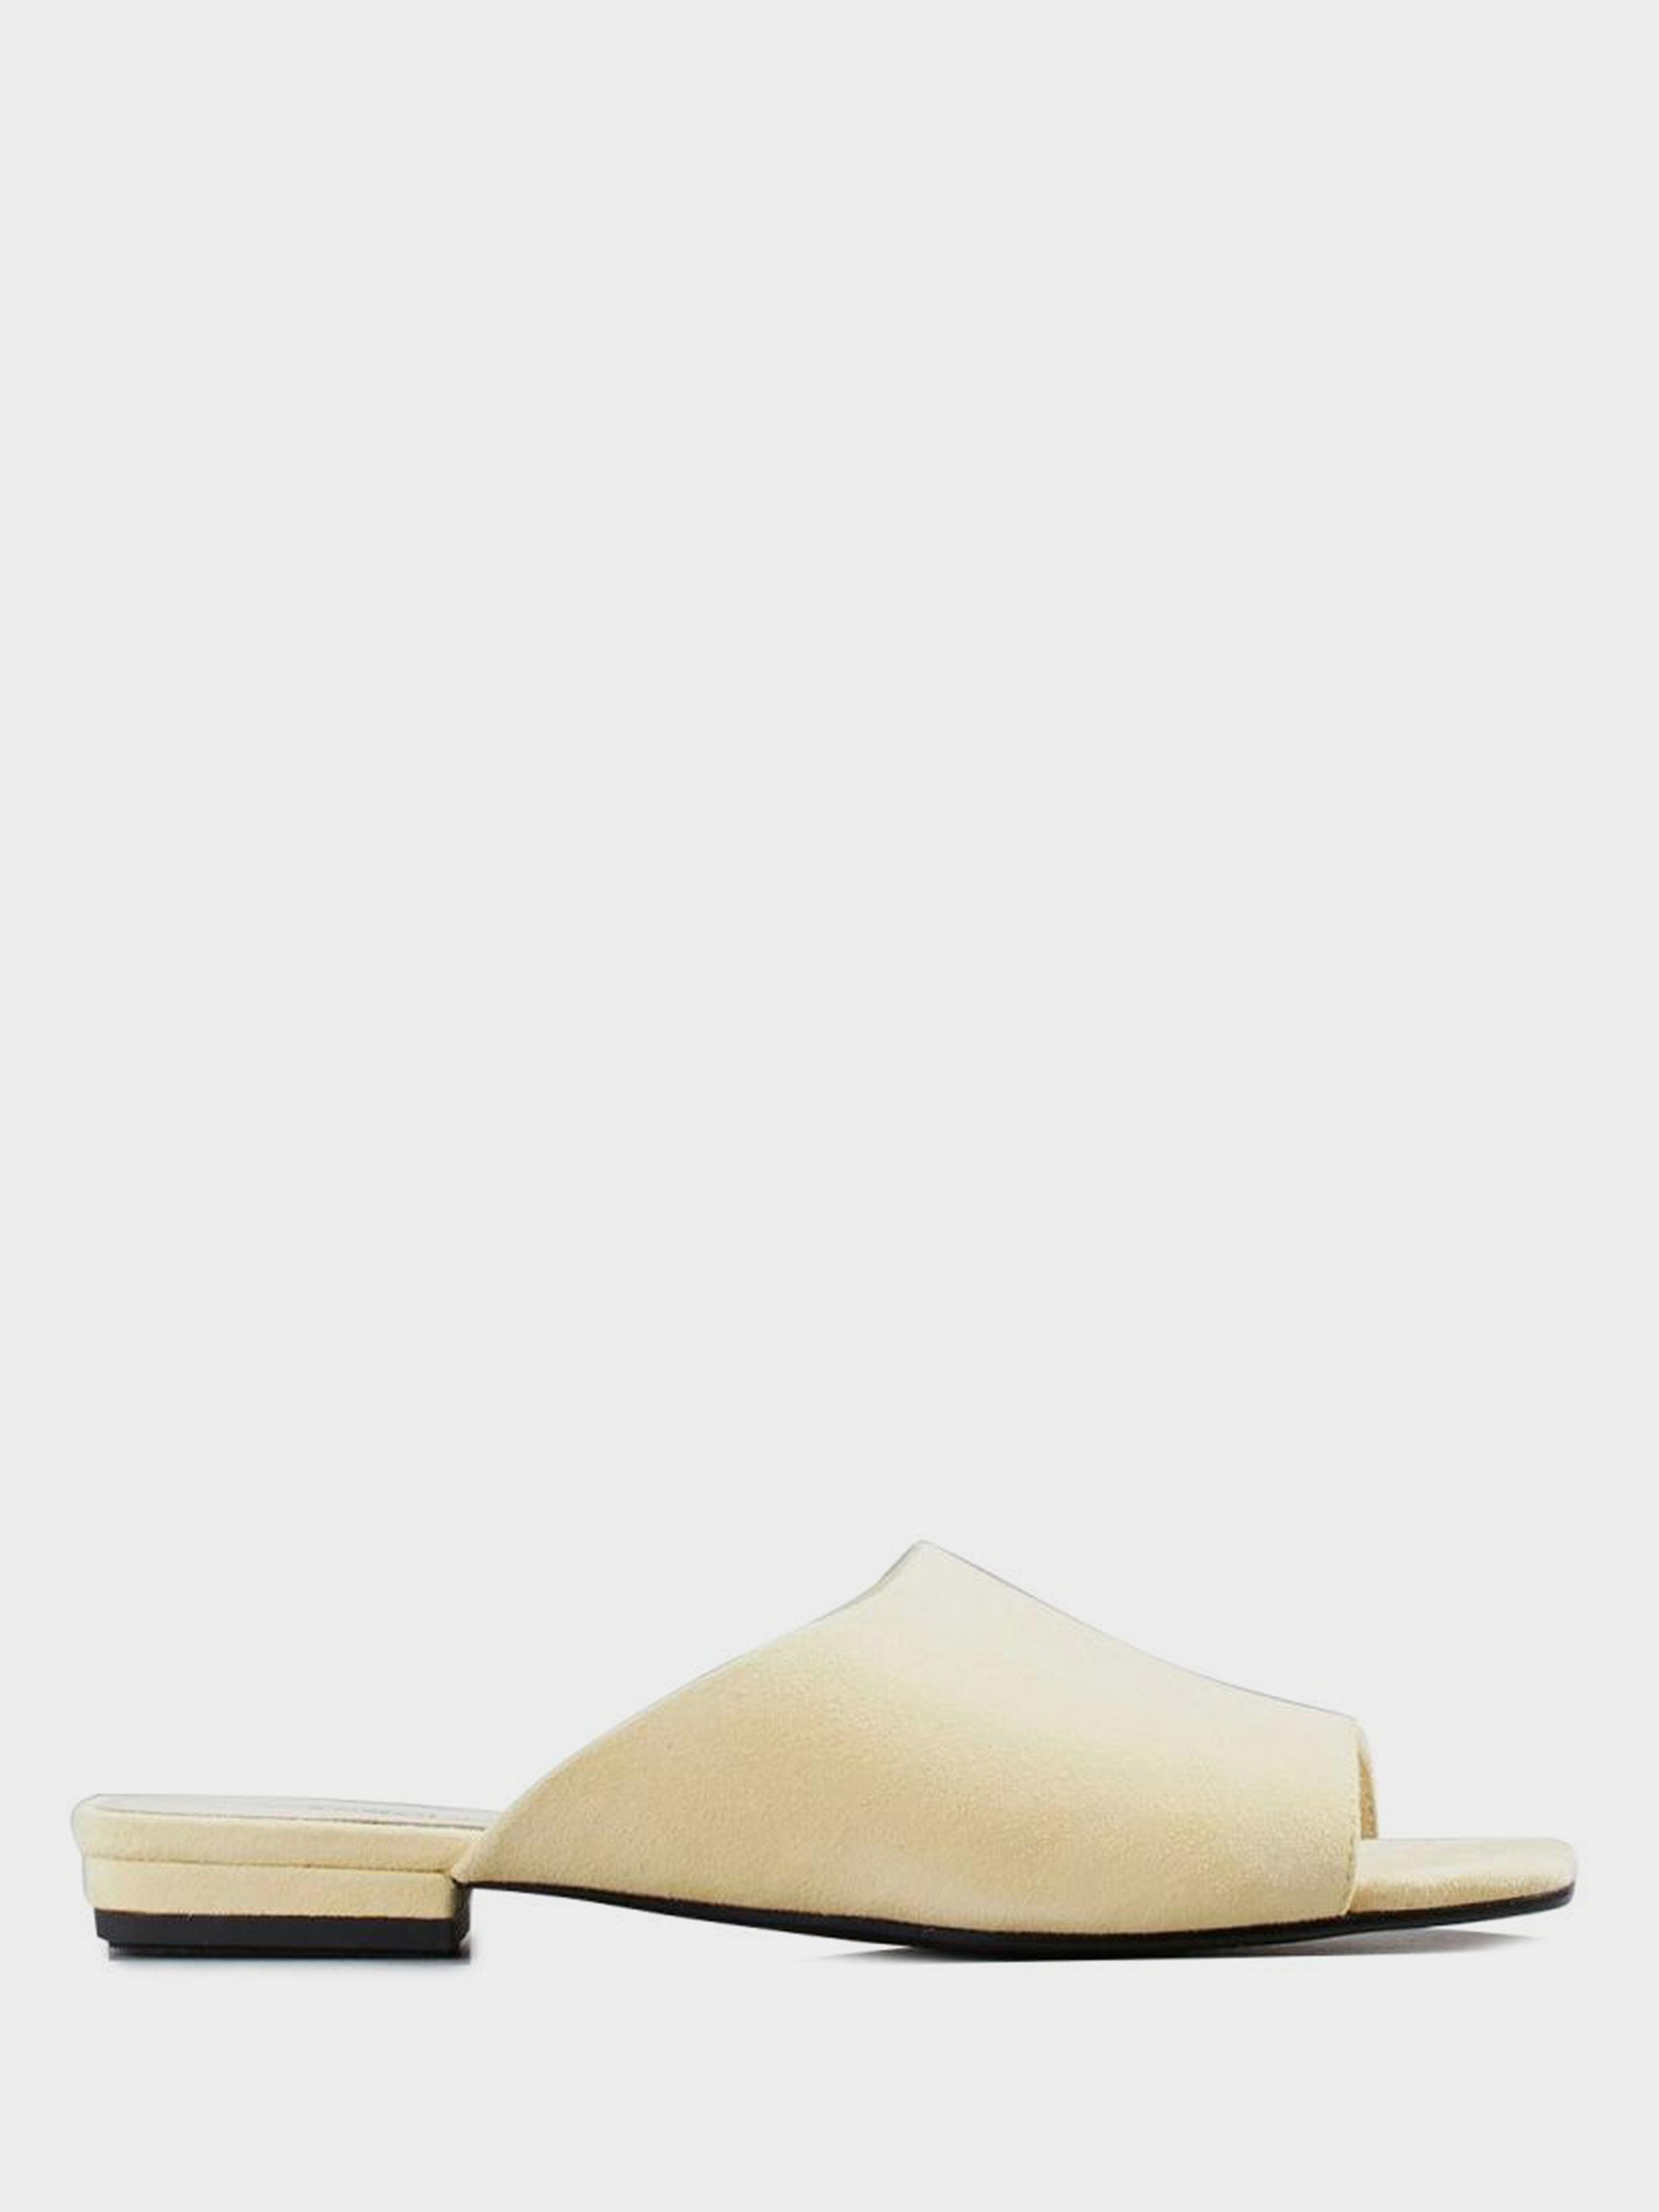 Шлёпанцы женские VAGABOND BECKY VW5434 модная обувь, 2017